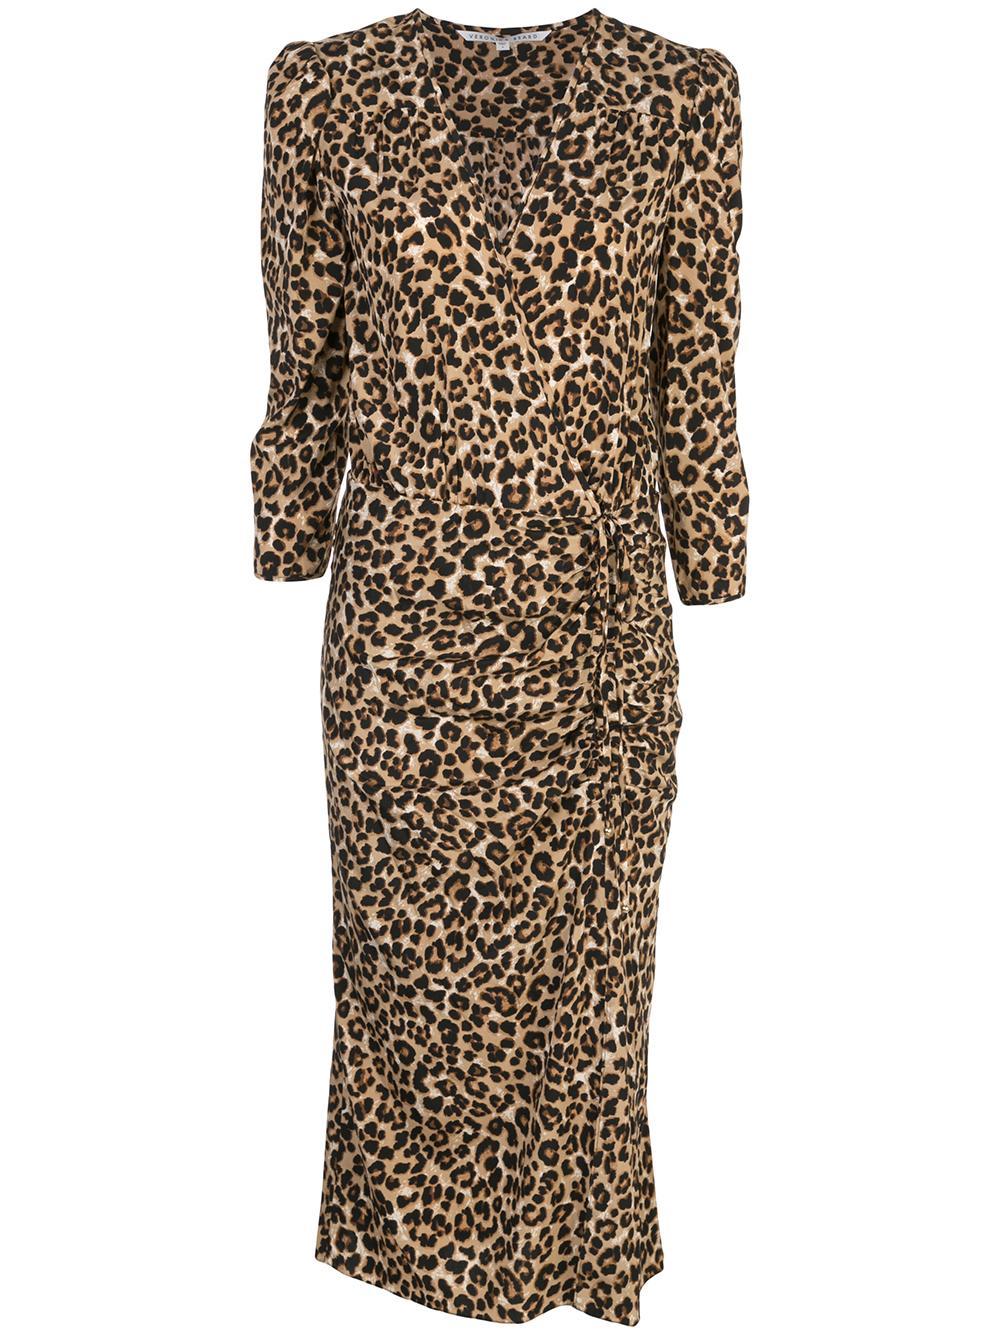 Arielle 3/4 Sleeve Midi Dress Item # 1907SDC012692